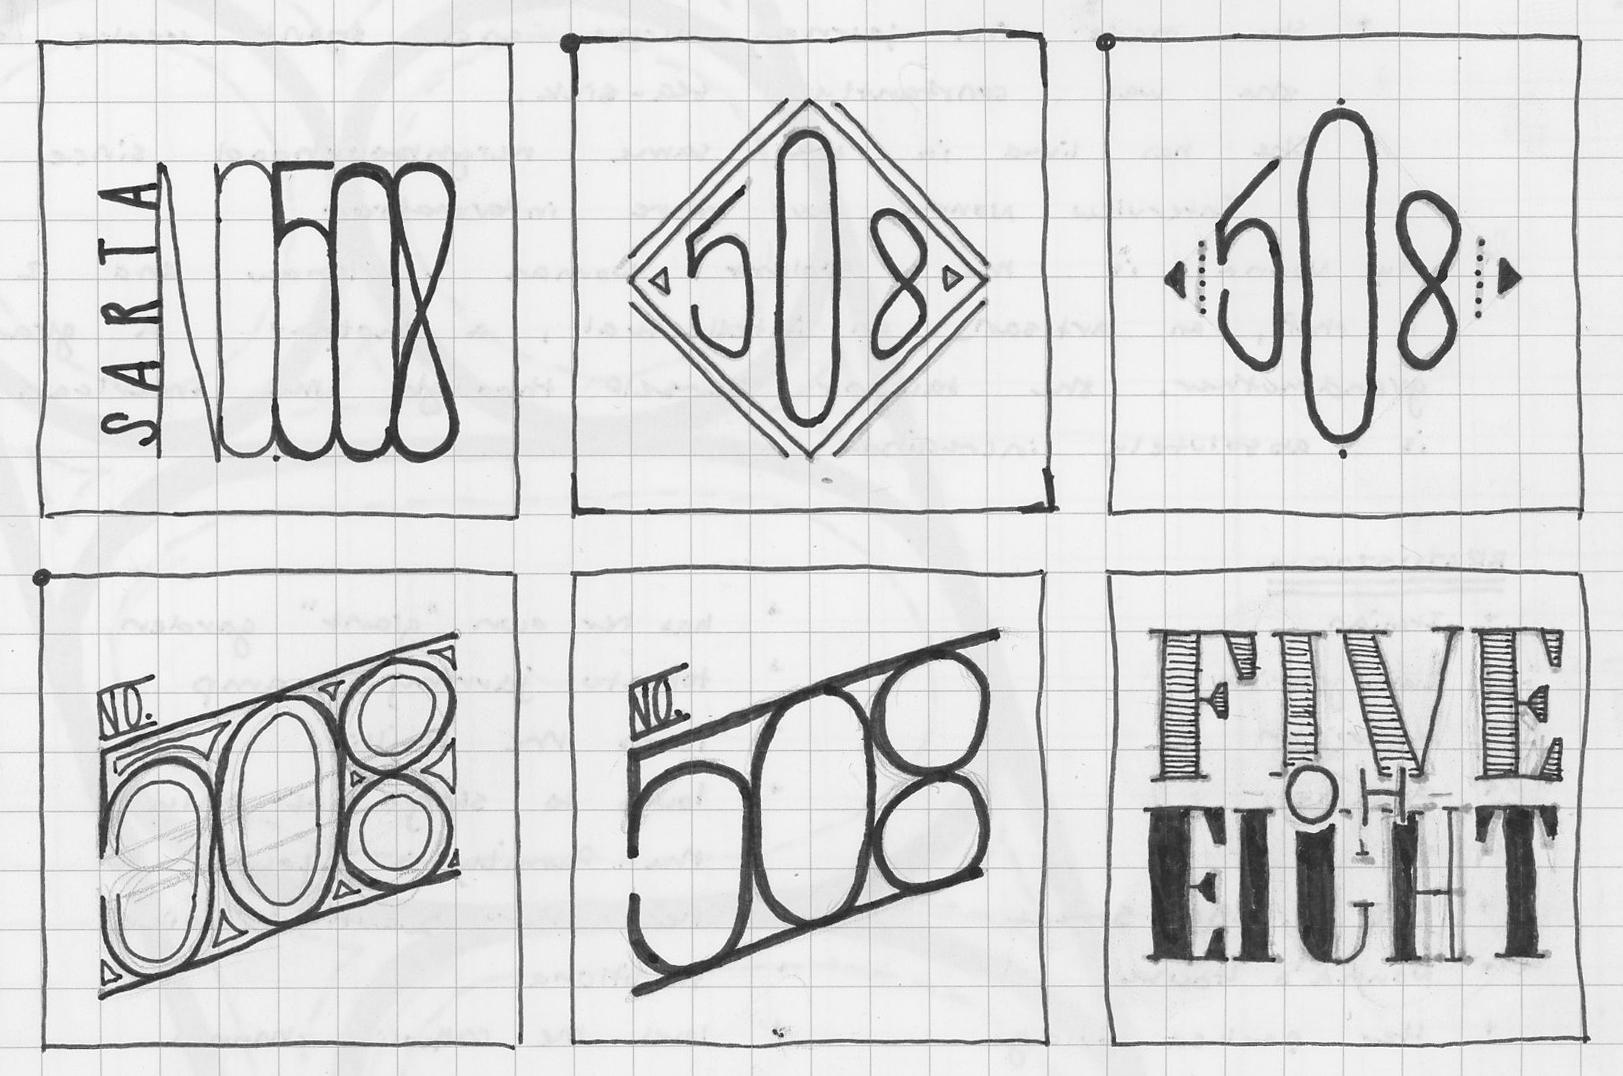 508_PROCESS_logothumbnails.jpg